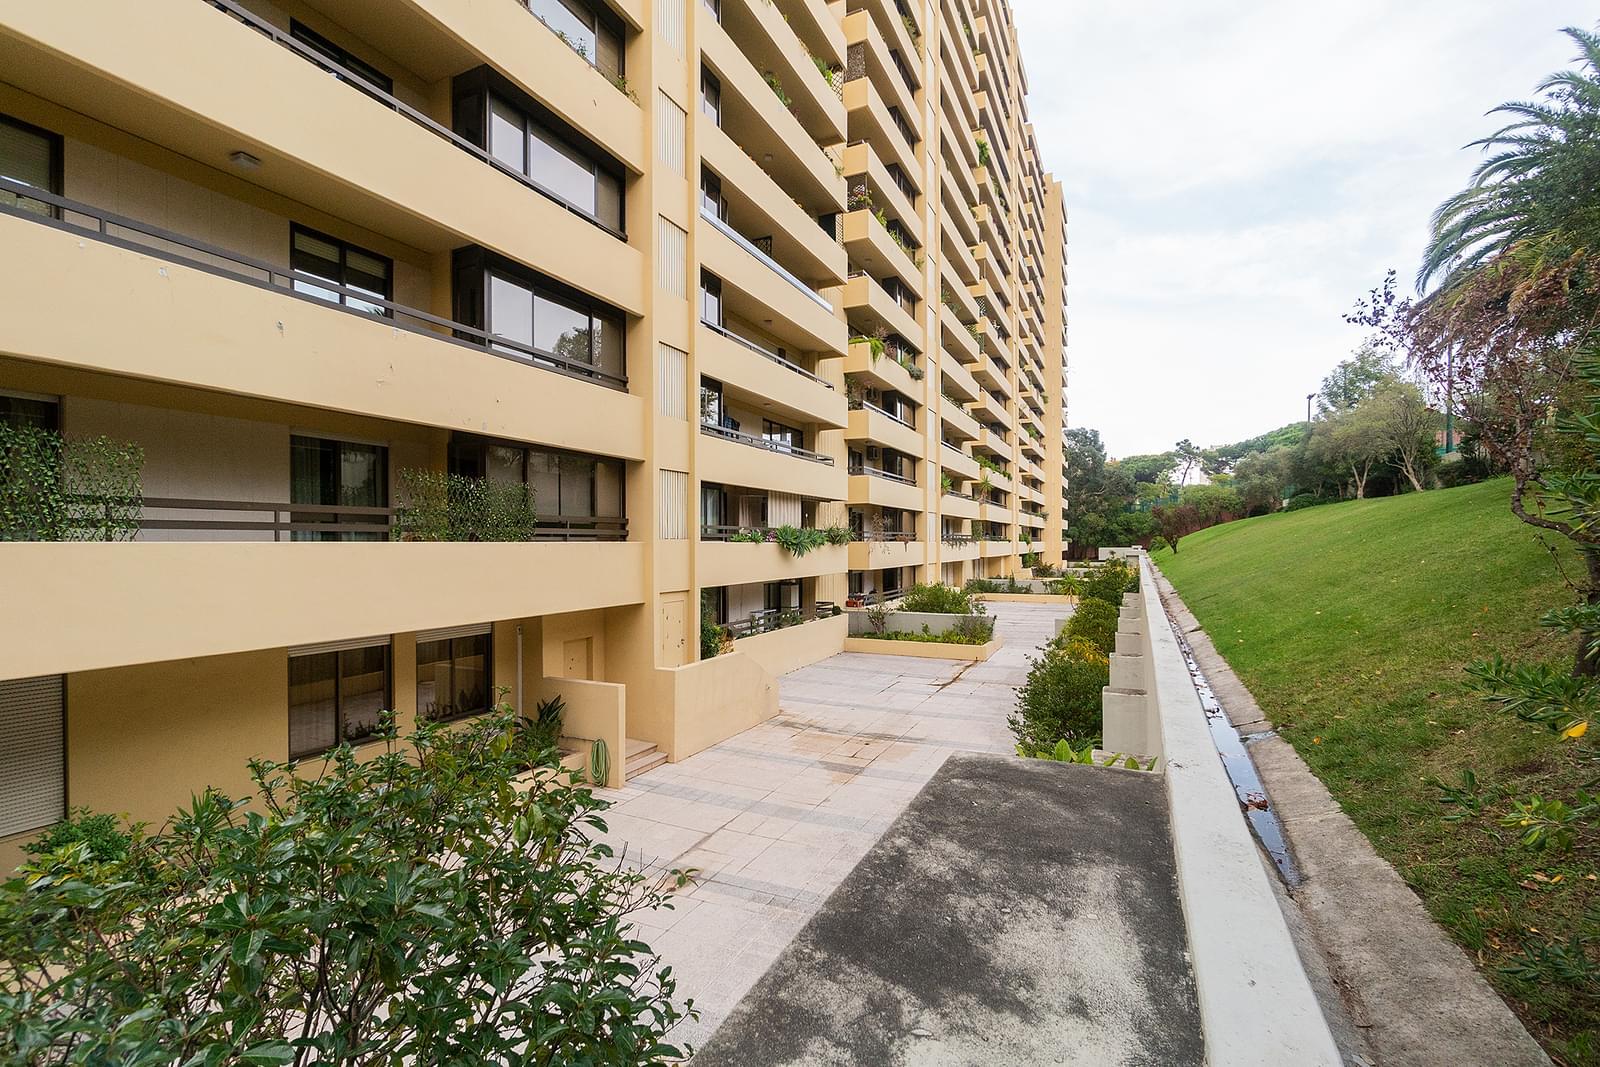 pf18551-apartamento-t3-1-lisboa-8cc18efc-1885-4901-89f6-ceb95762fe19